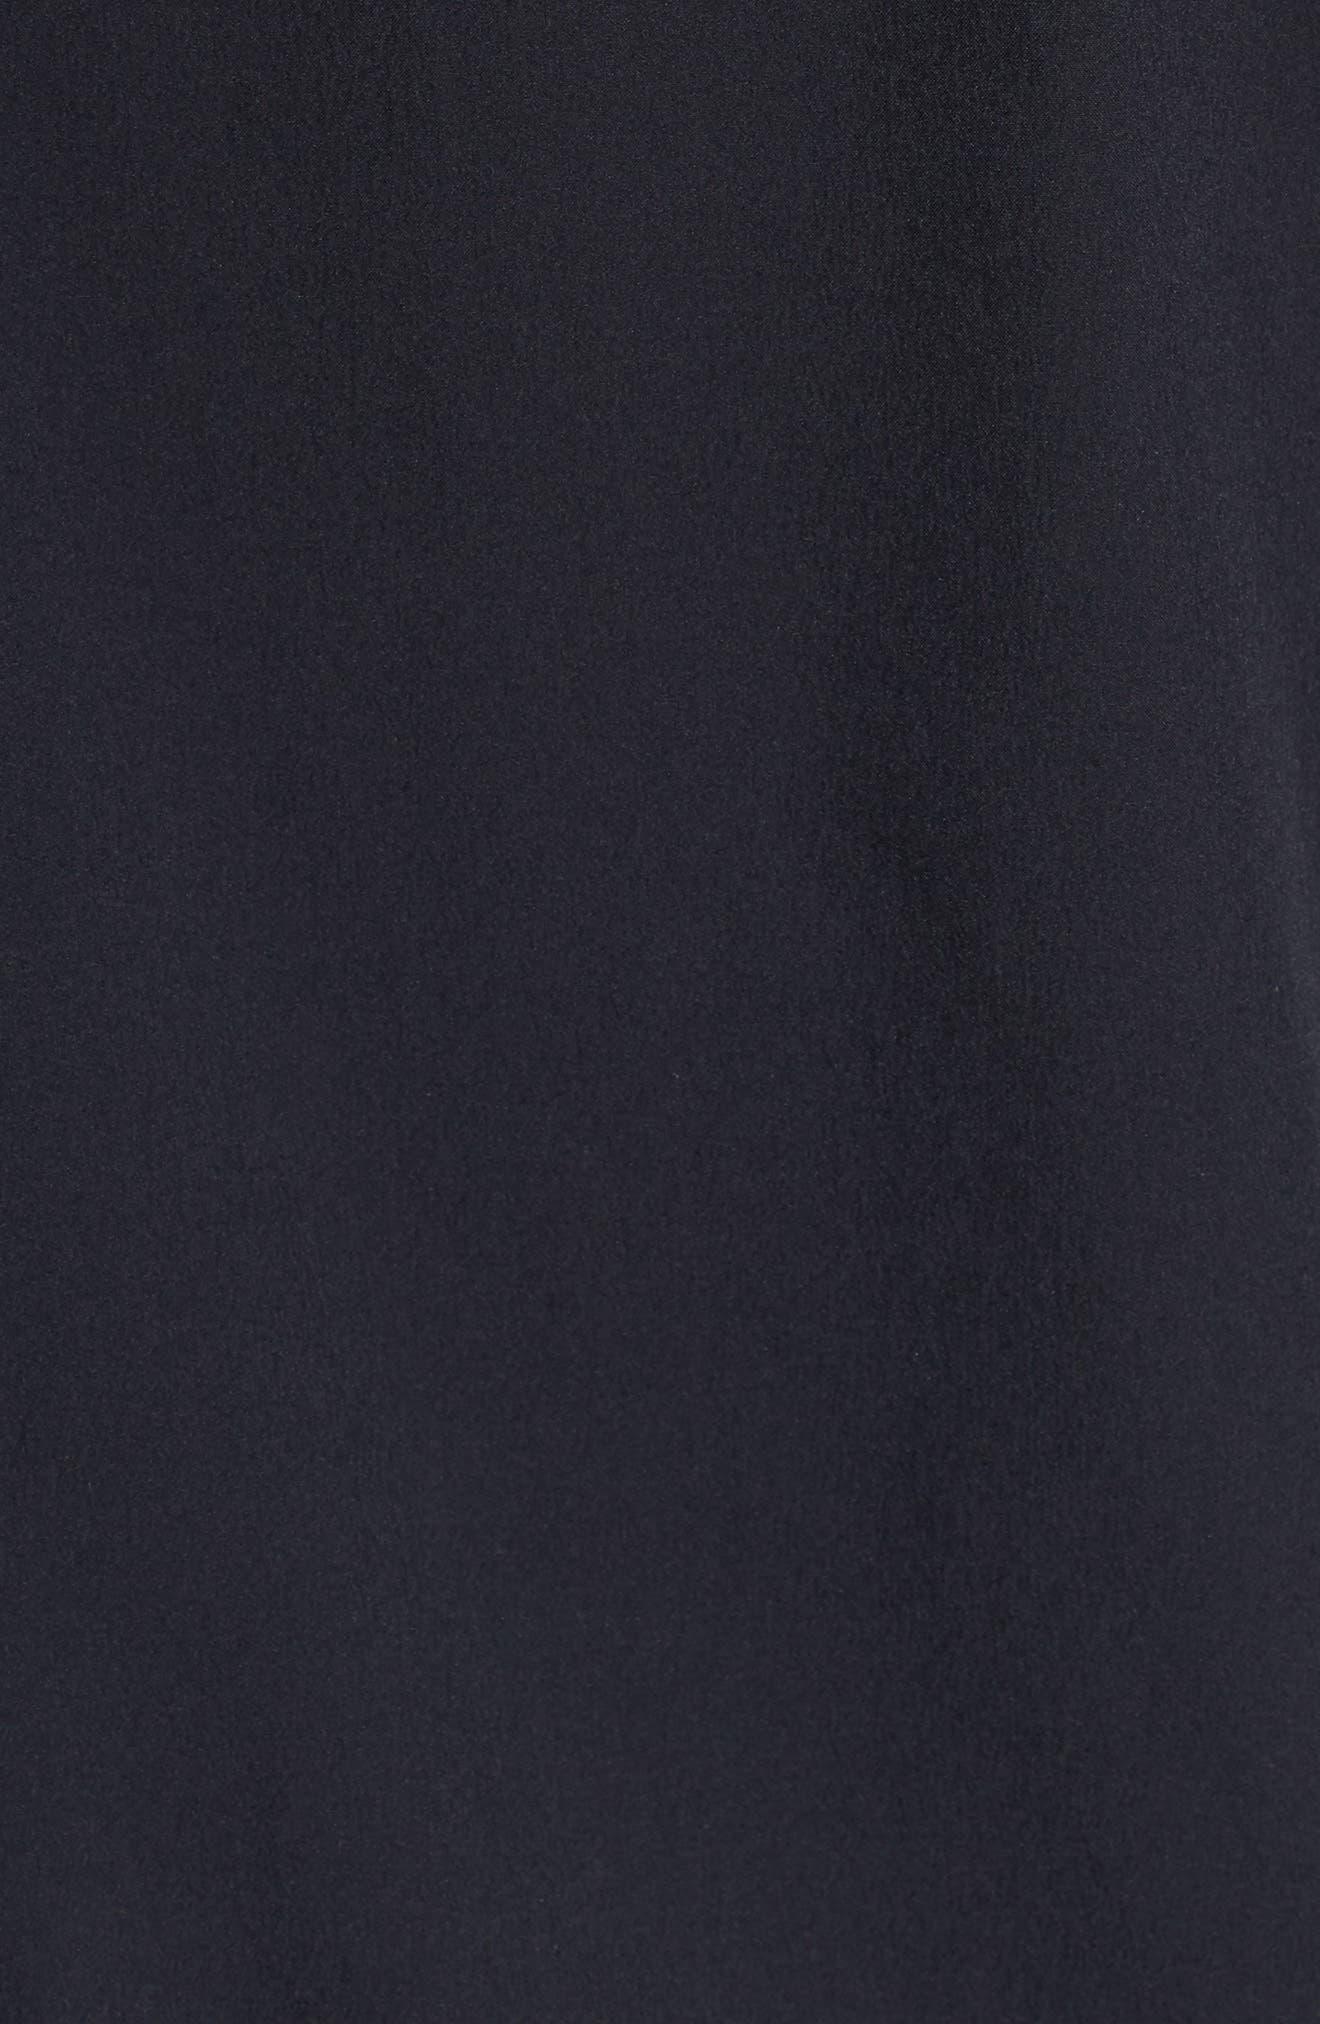 UNDER ARMOUR, Baseline Hooded Jacket, Alternate thumbnail 7, color, 001